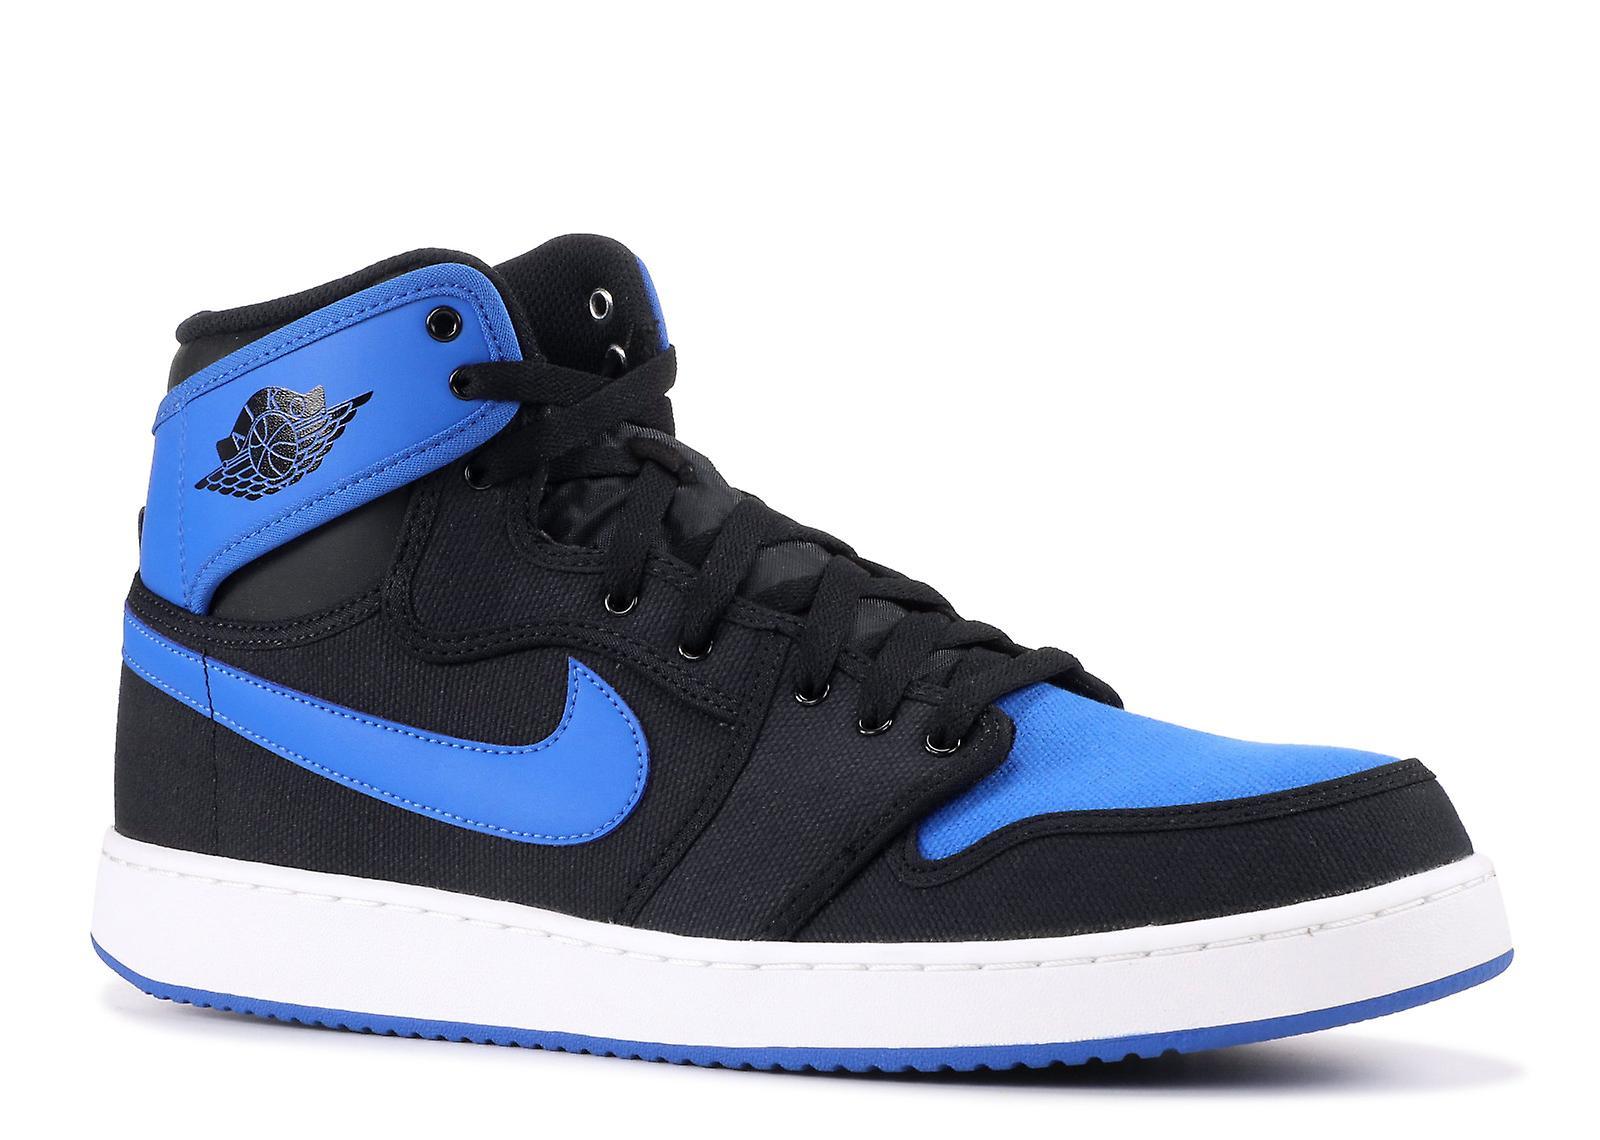 Aj1 Ko haute  Ajko  - 638471 - 007 - chaussures